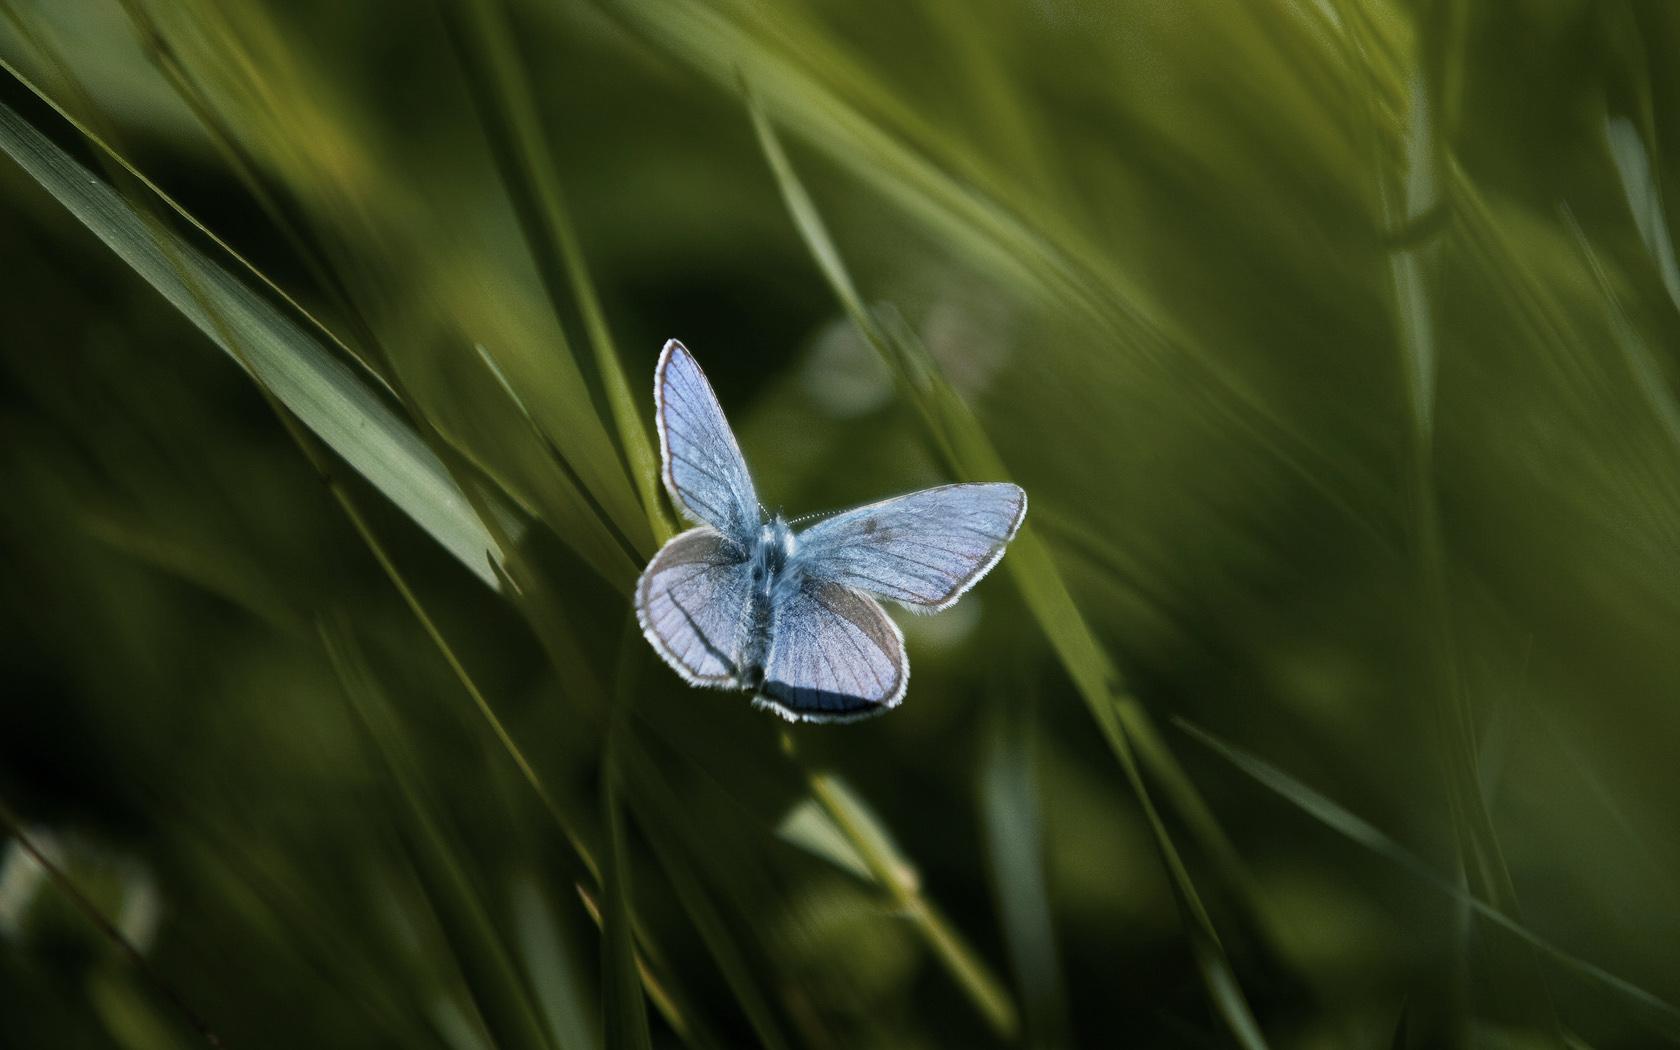 Lepidoptera by Smattila